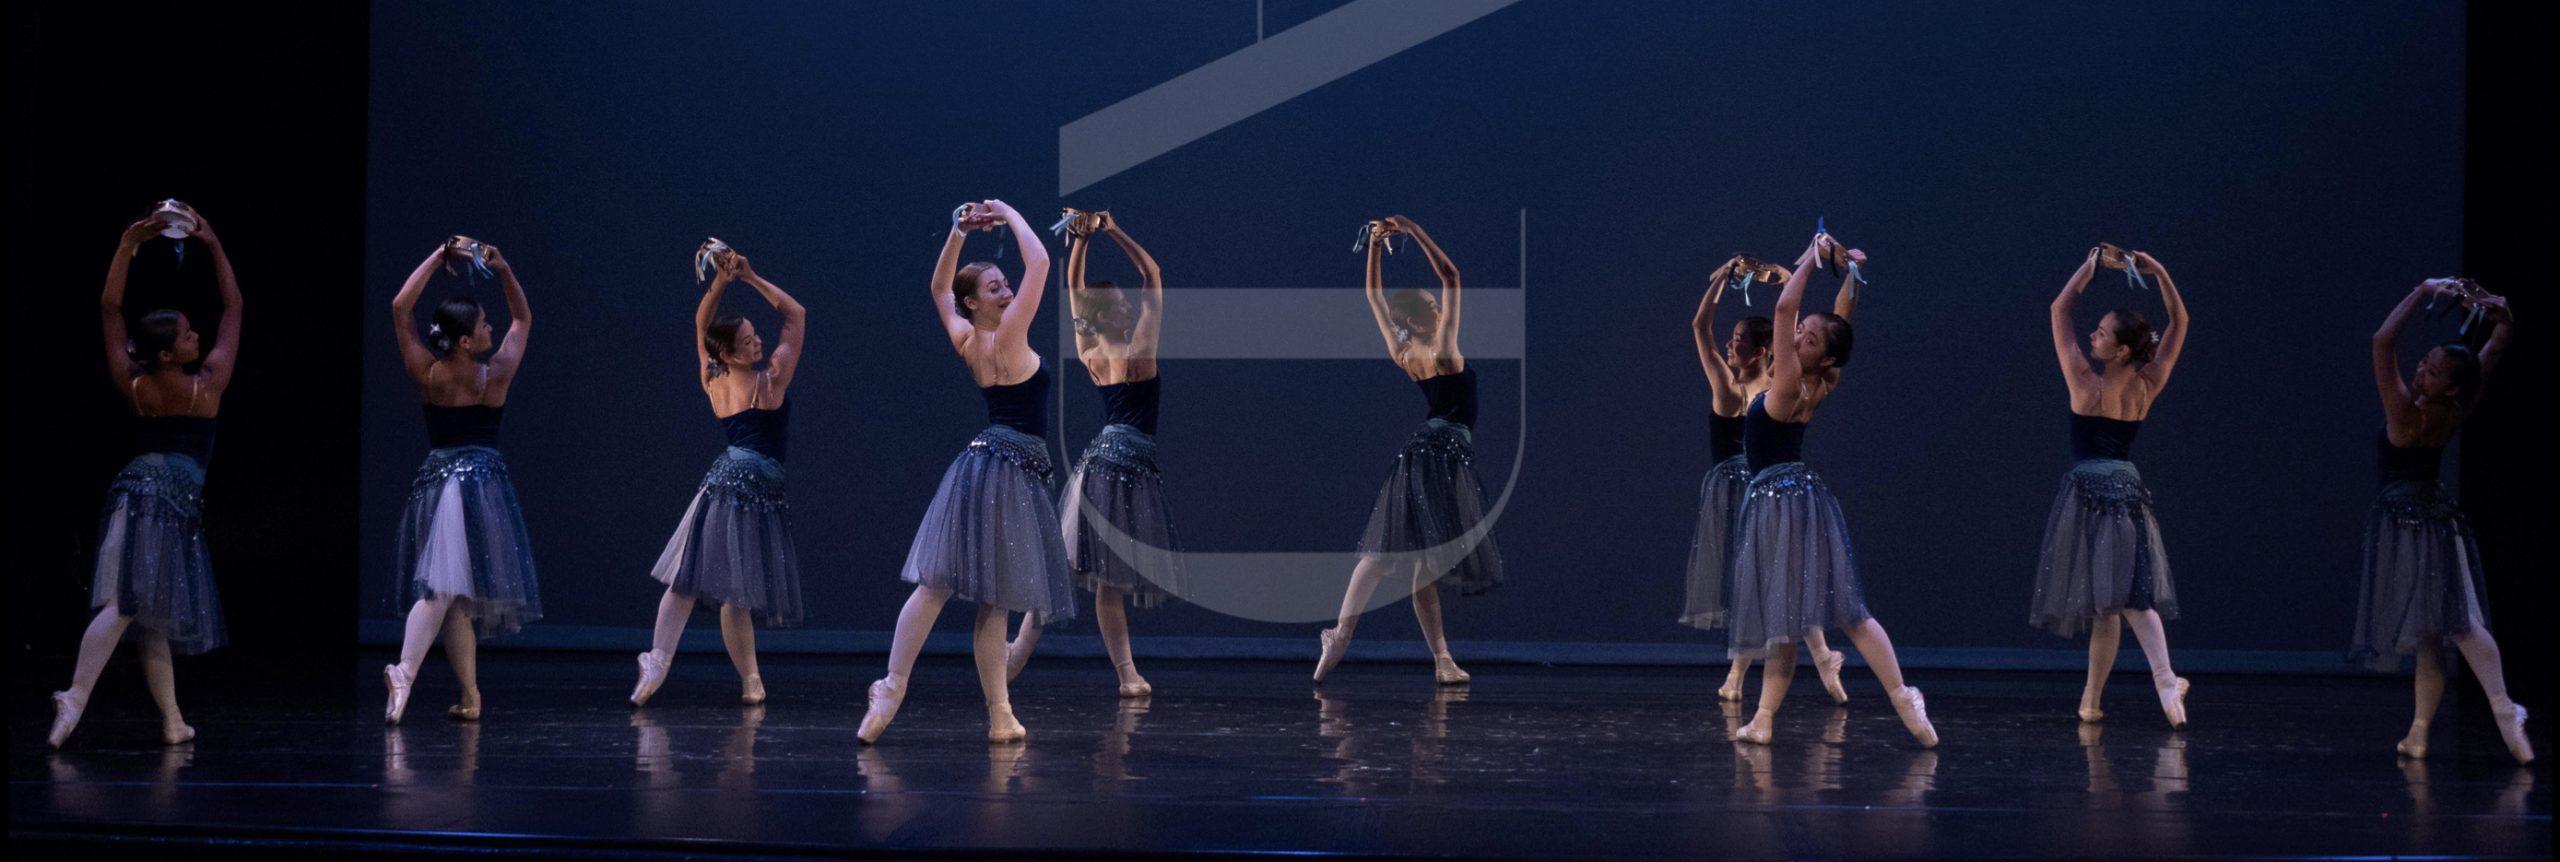 Events Banner 2019. Esmeralda ballet with tutu and tambourines at Clarke Theatre 2018.